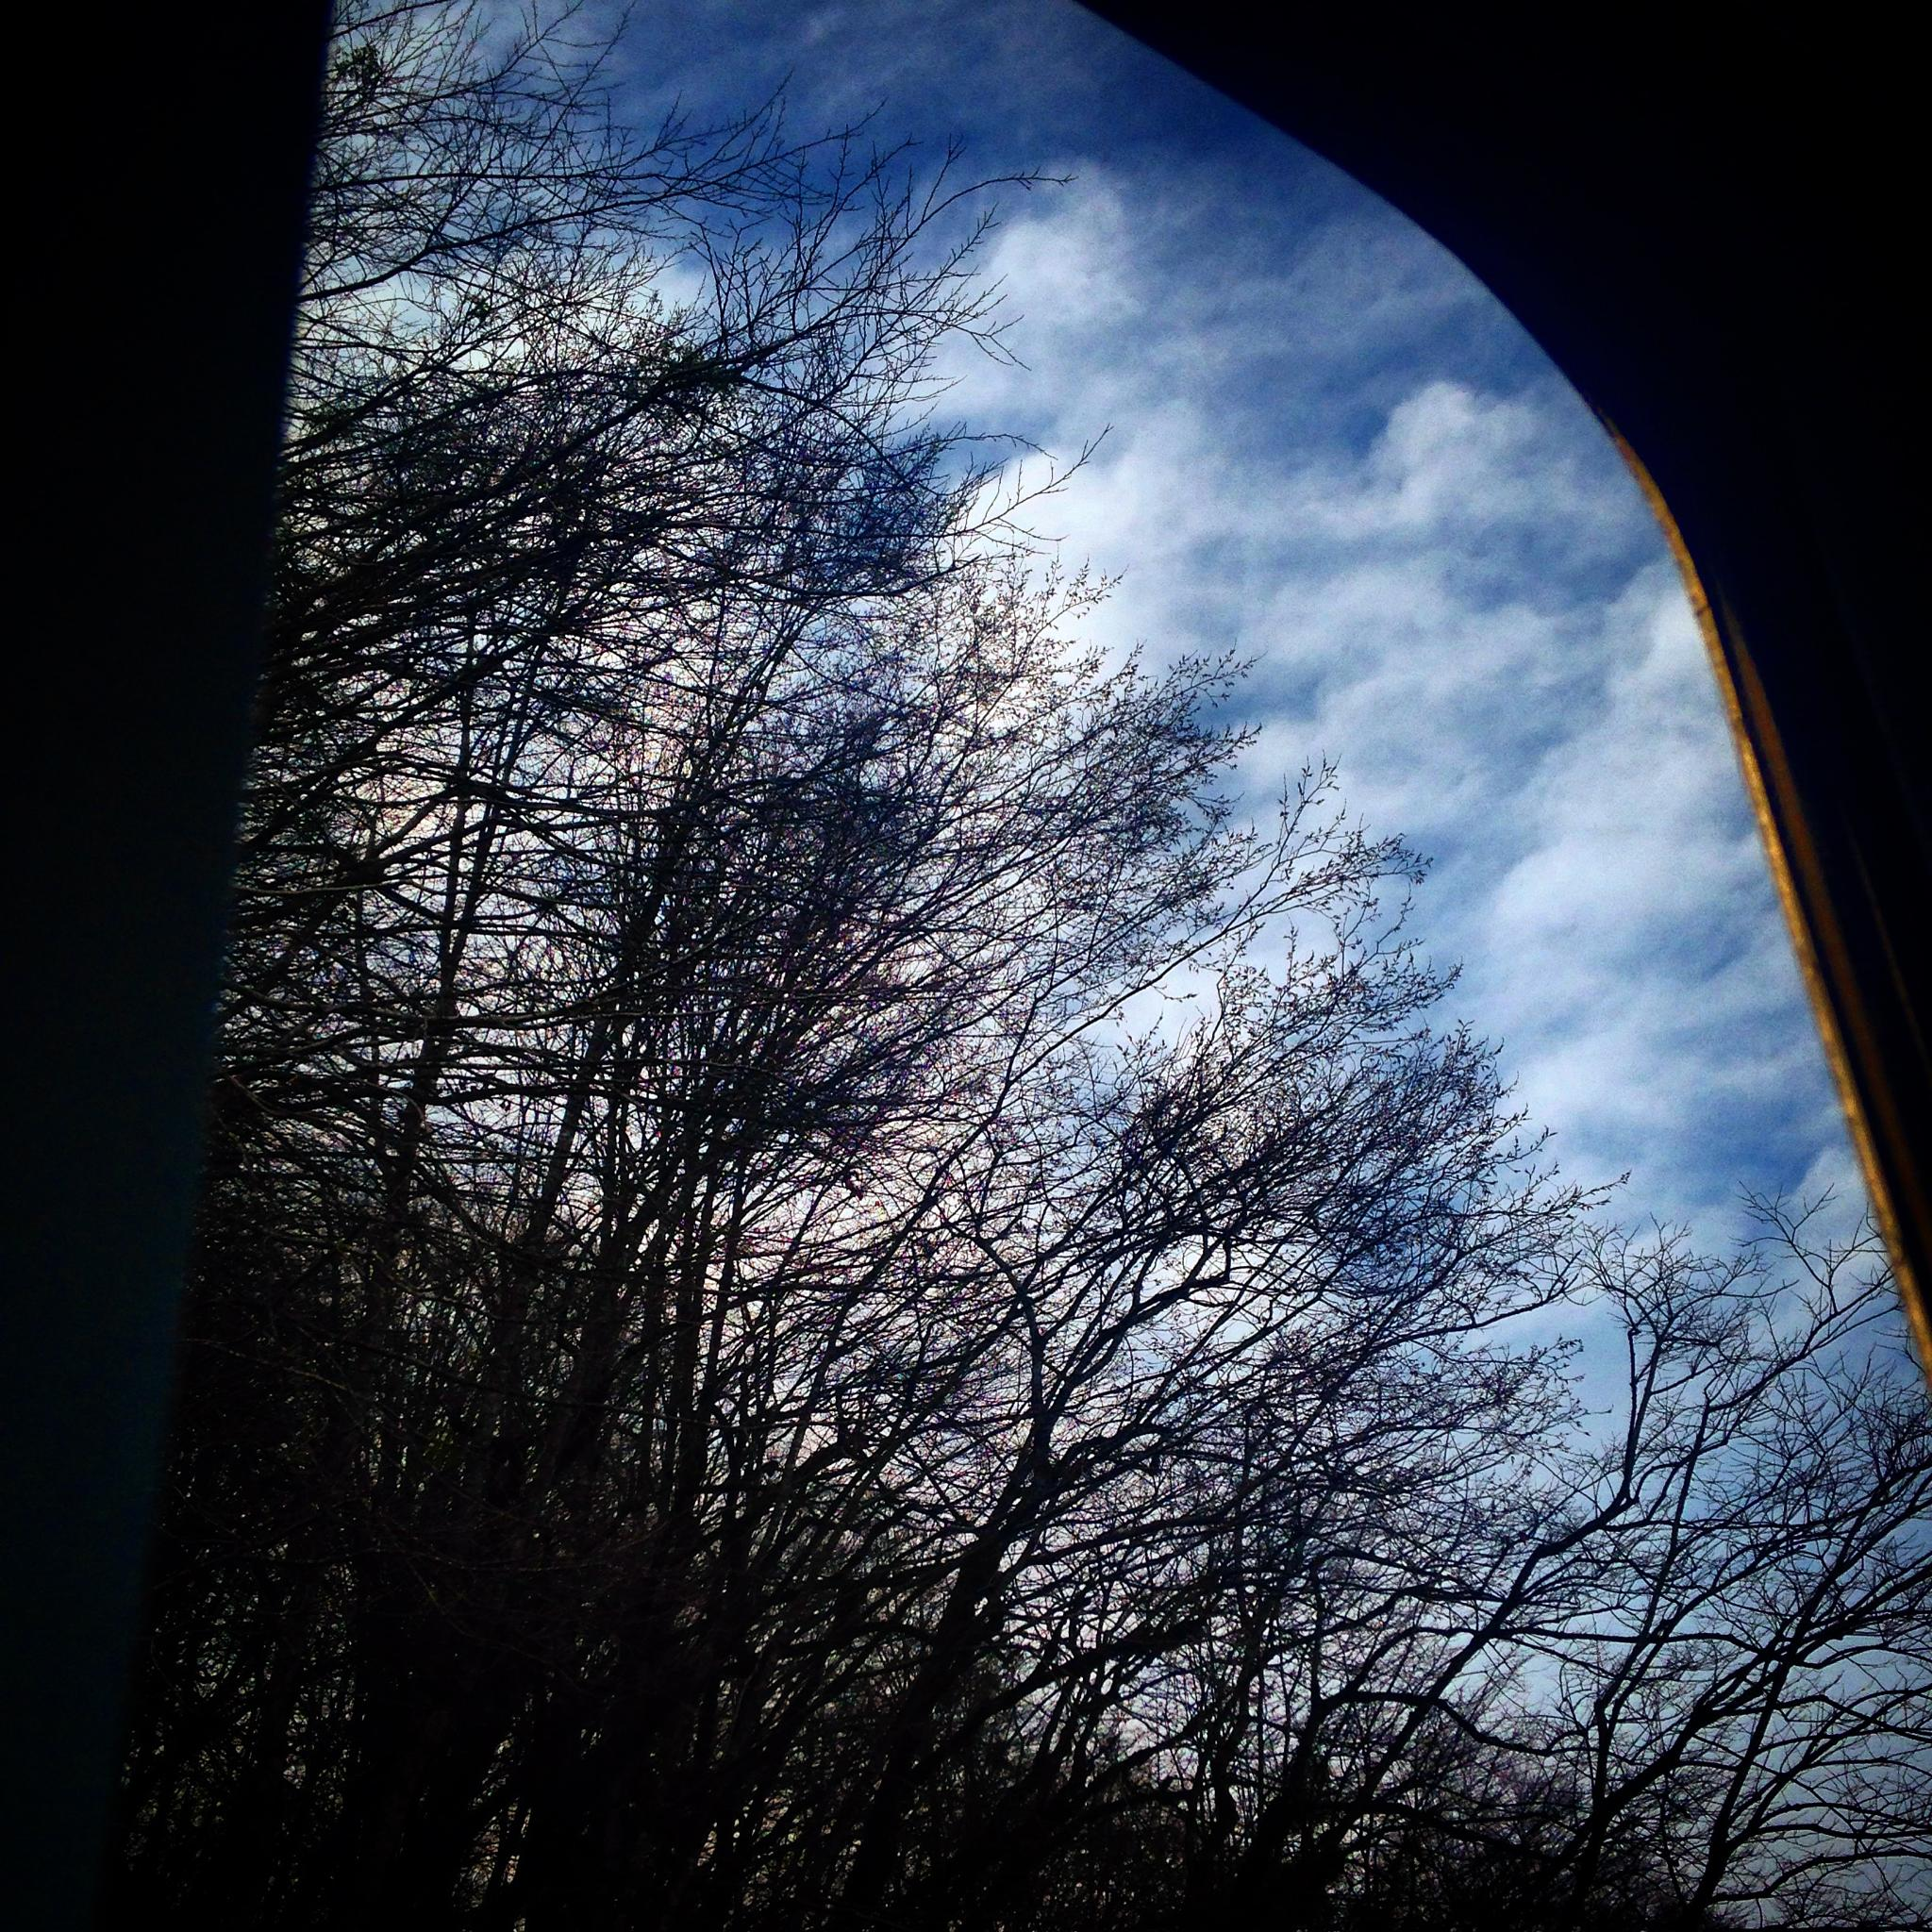 Above trees by sahoora83